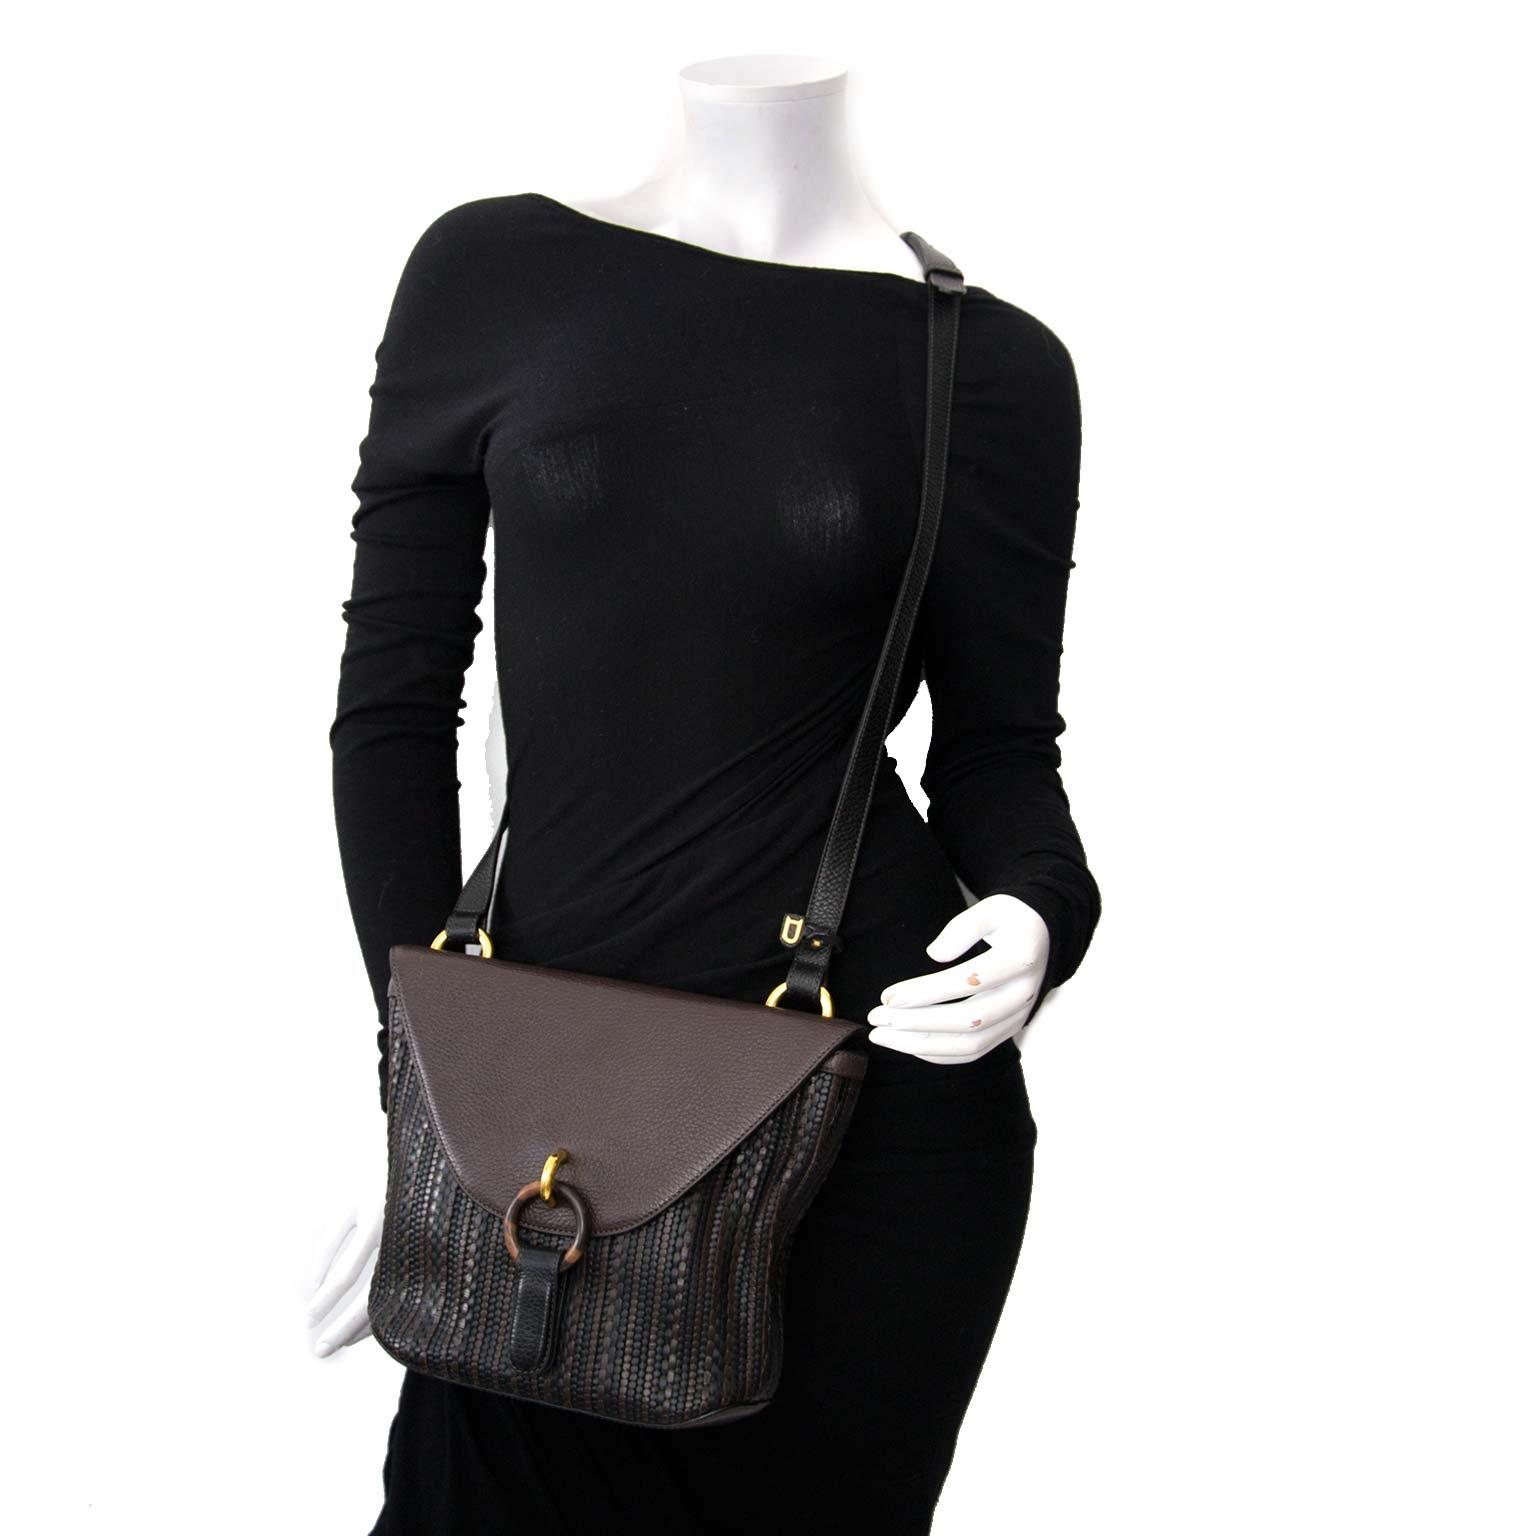 Delvaux Brown Toile de Cuir Crossbody Bag for sale online at Labellov